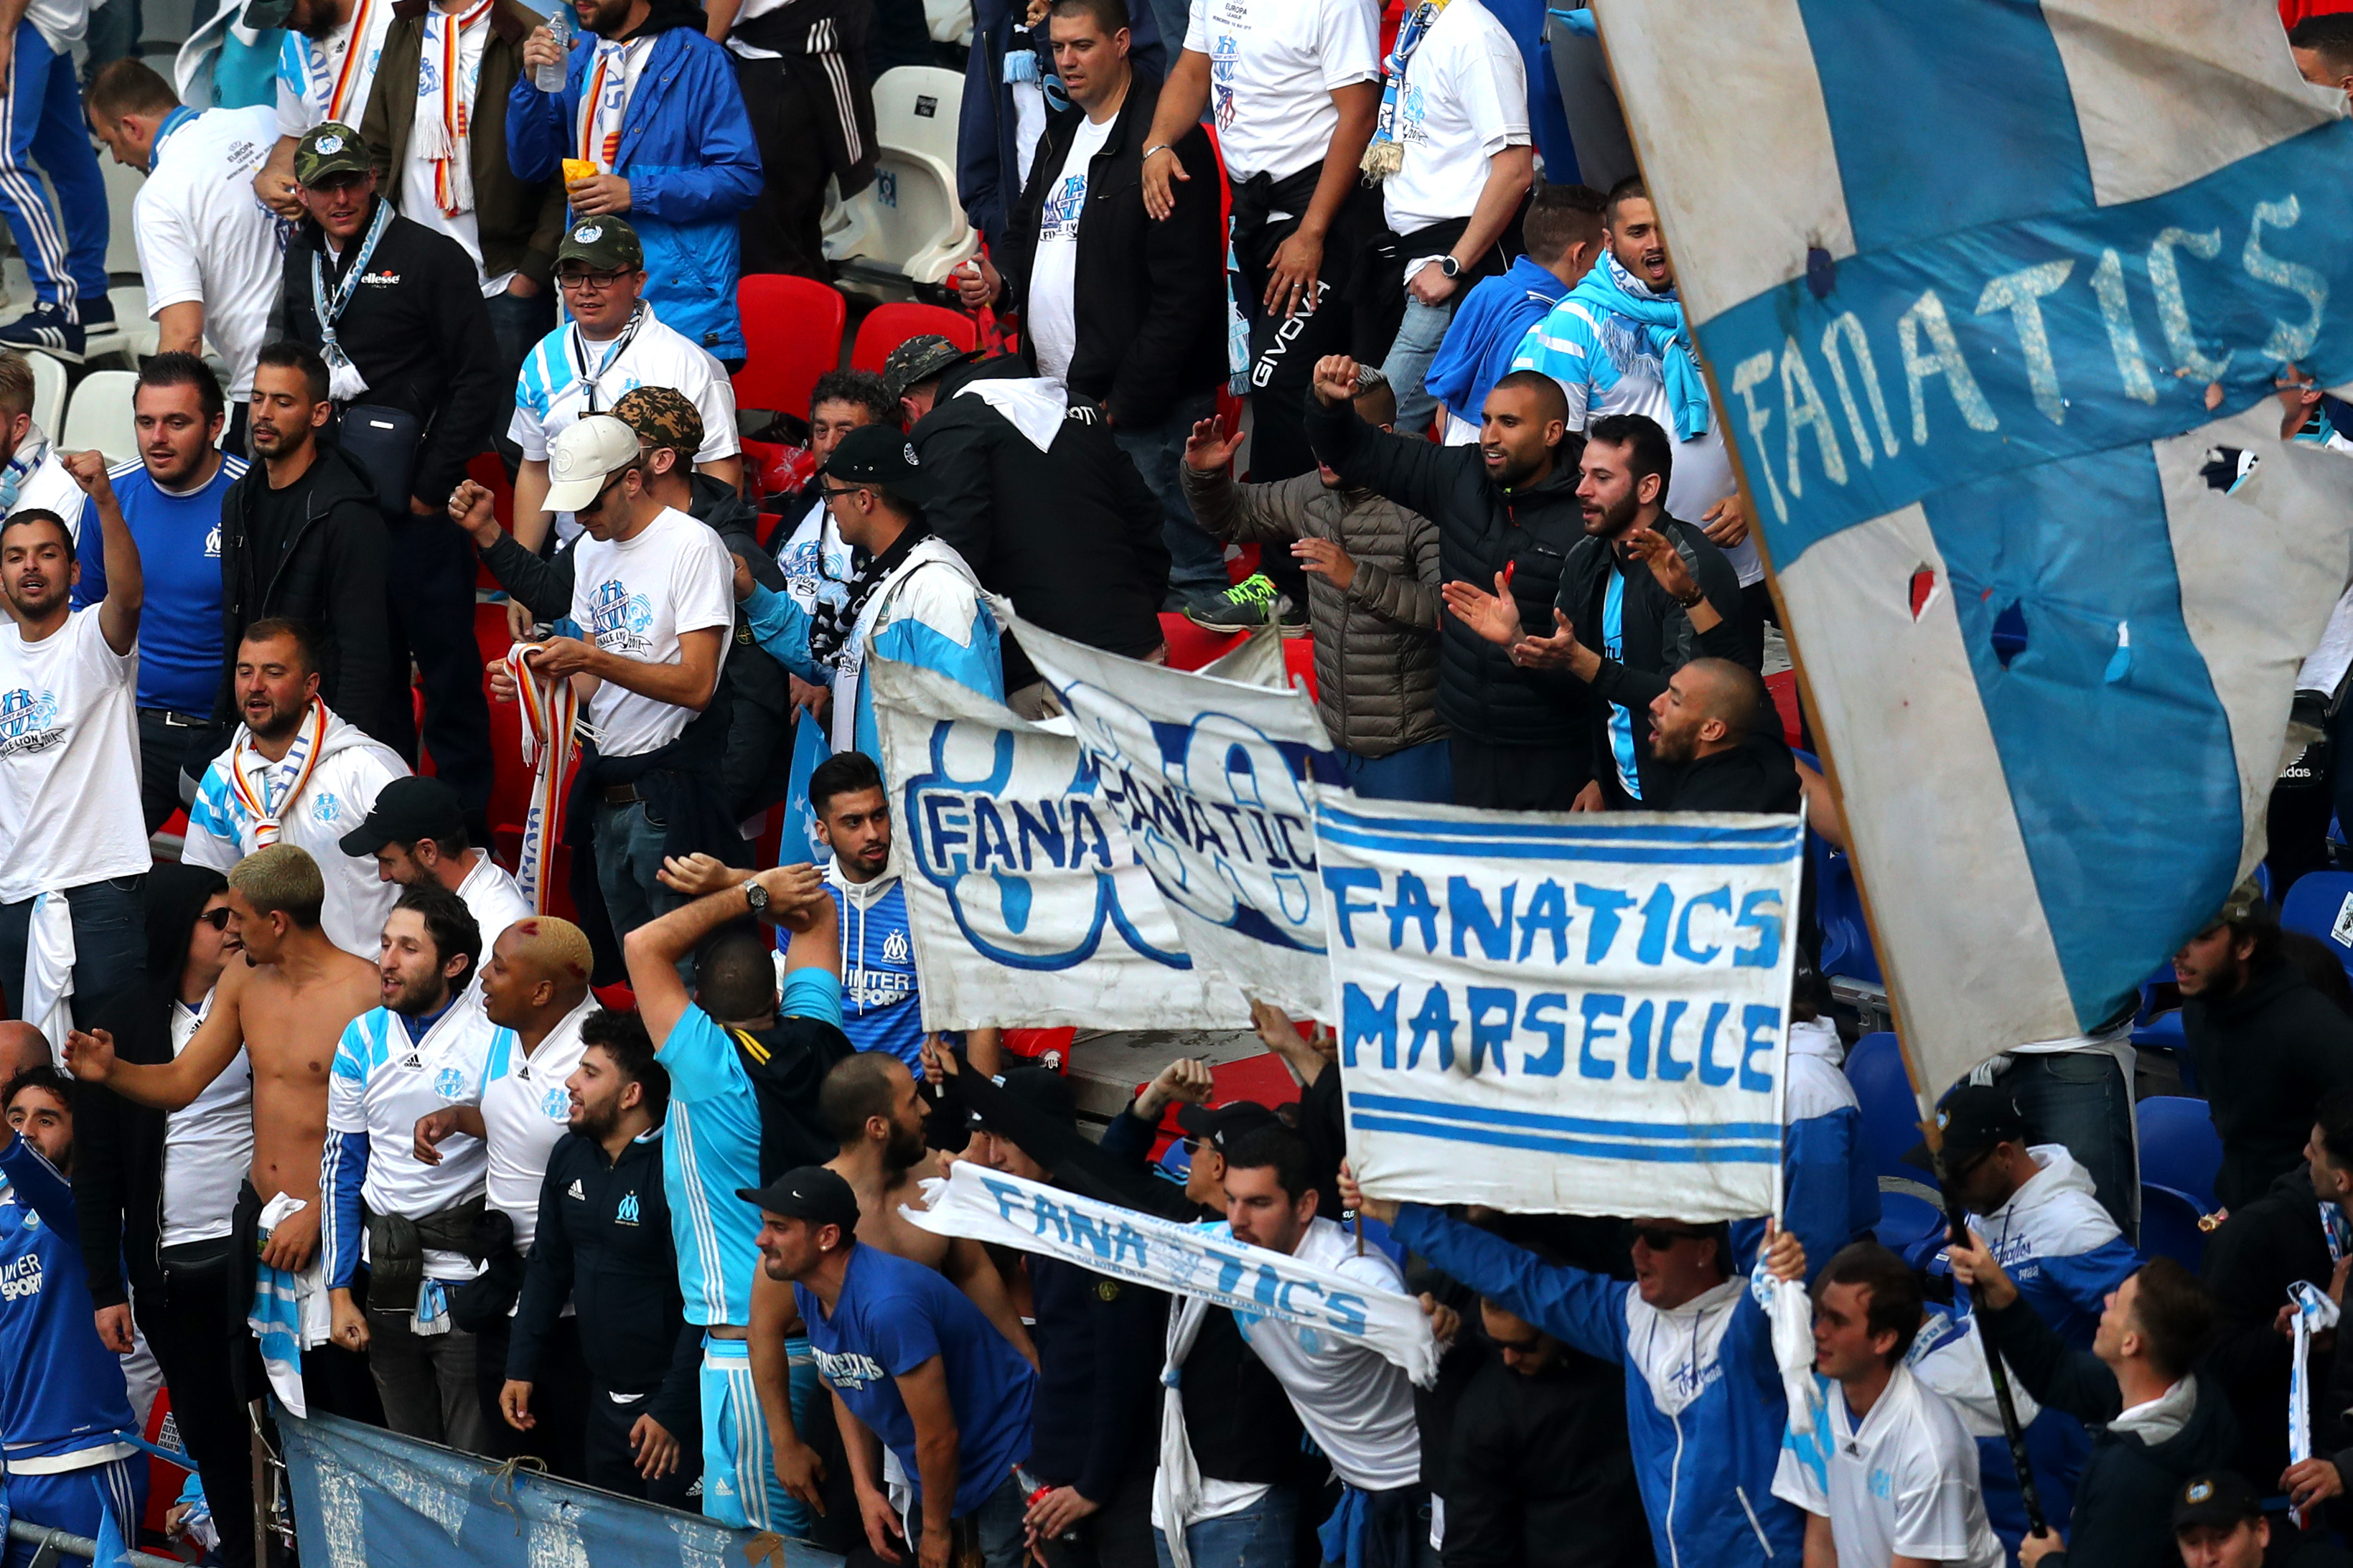 UEL Fans Marseille